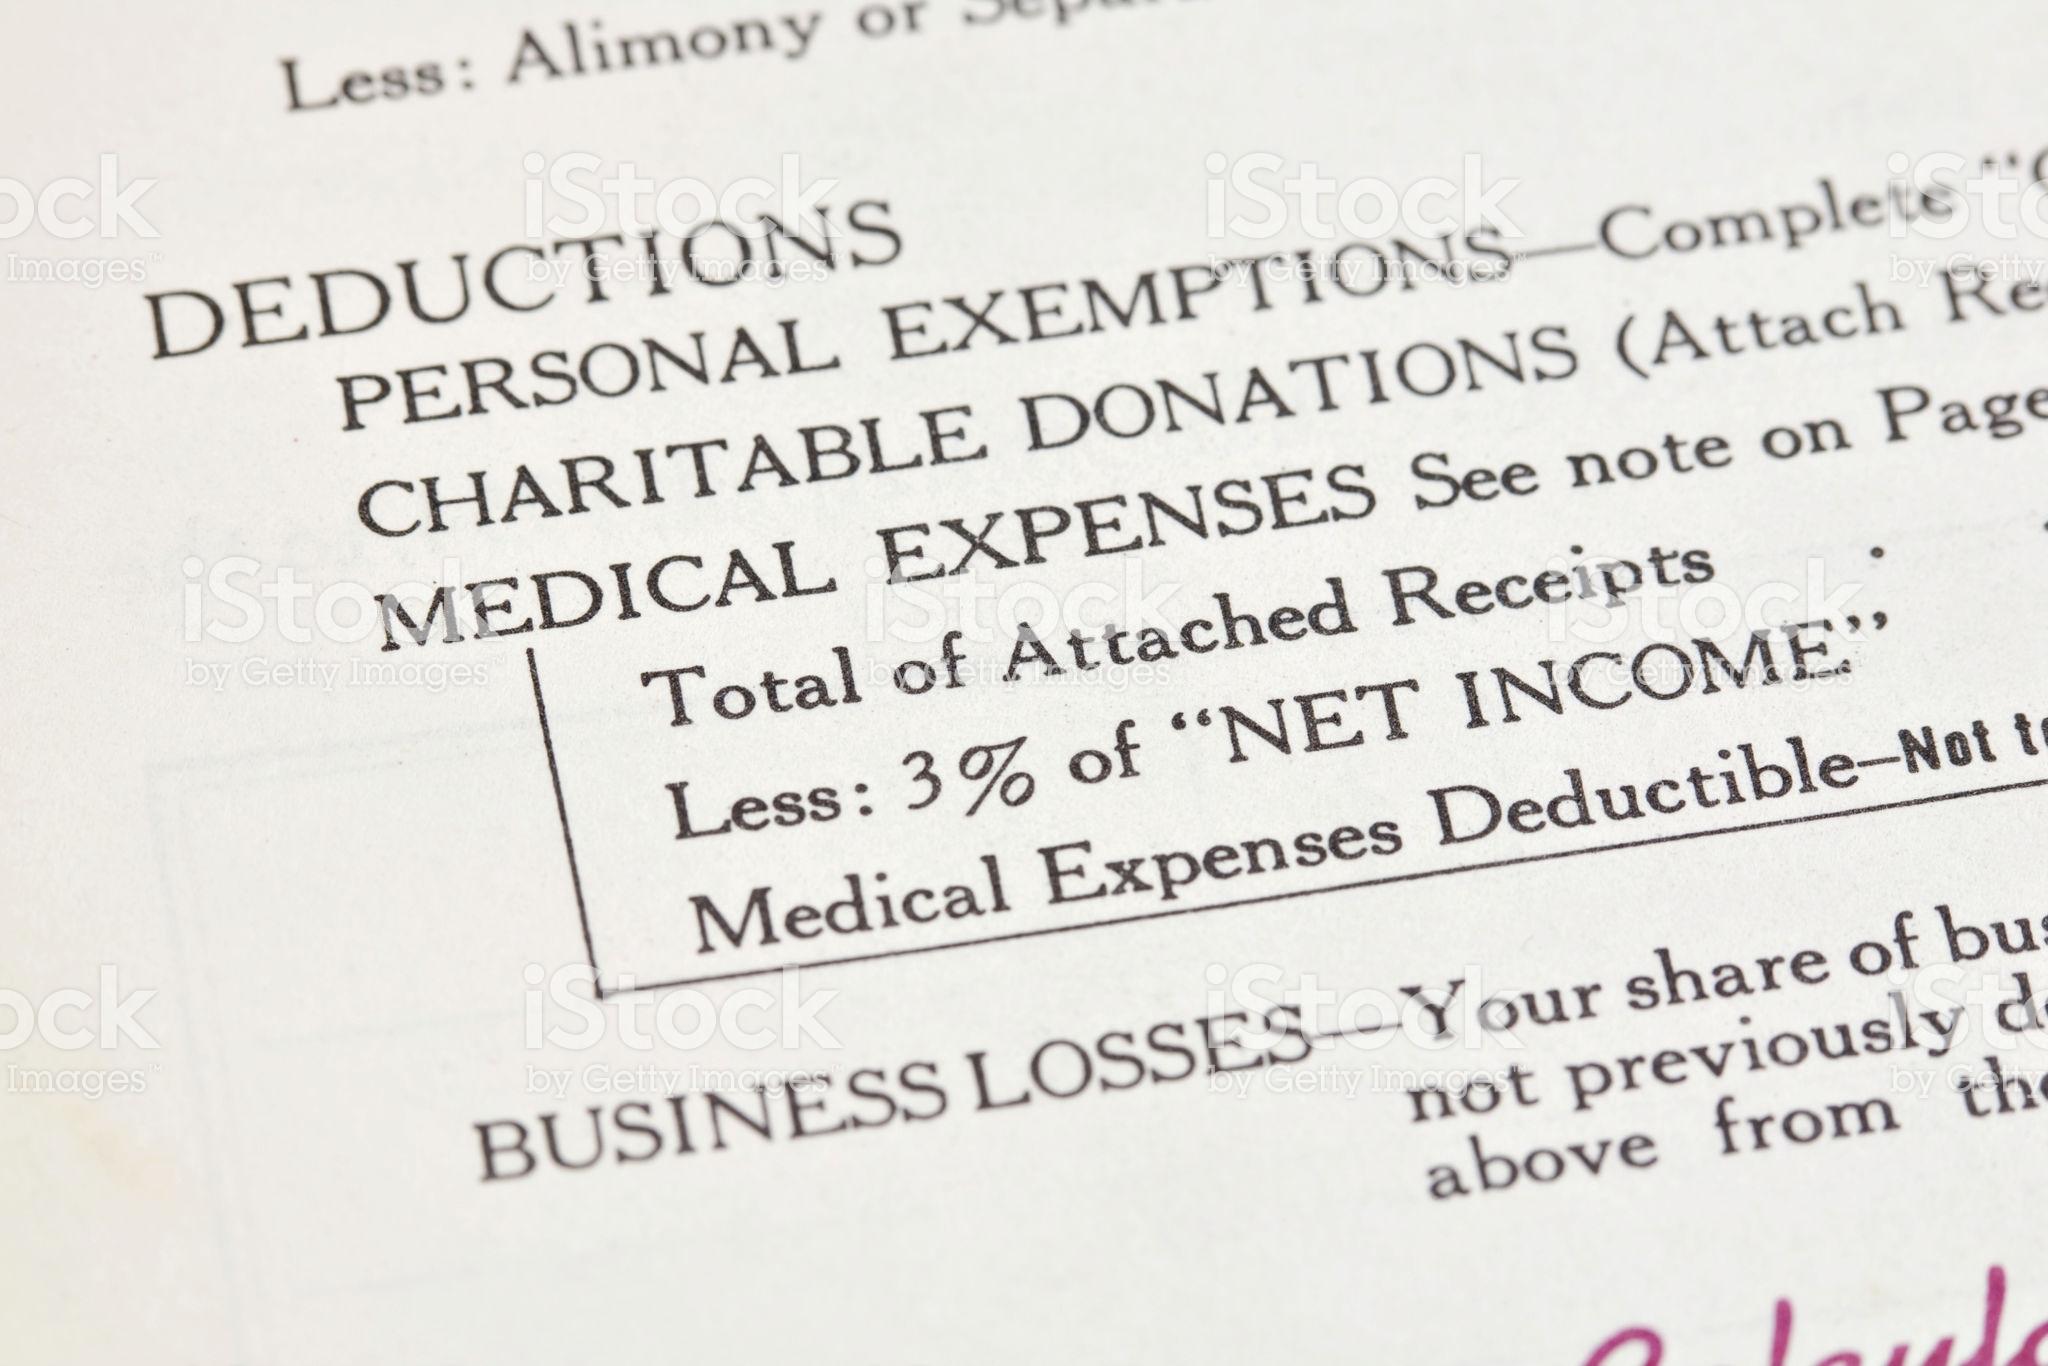 How a Charitable Deduction Translates Into Tax Savings